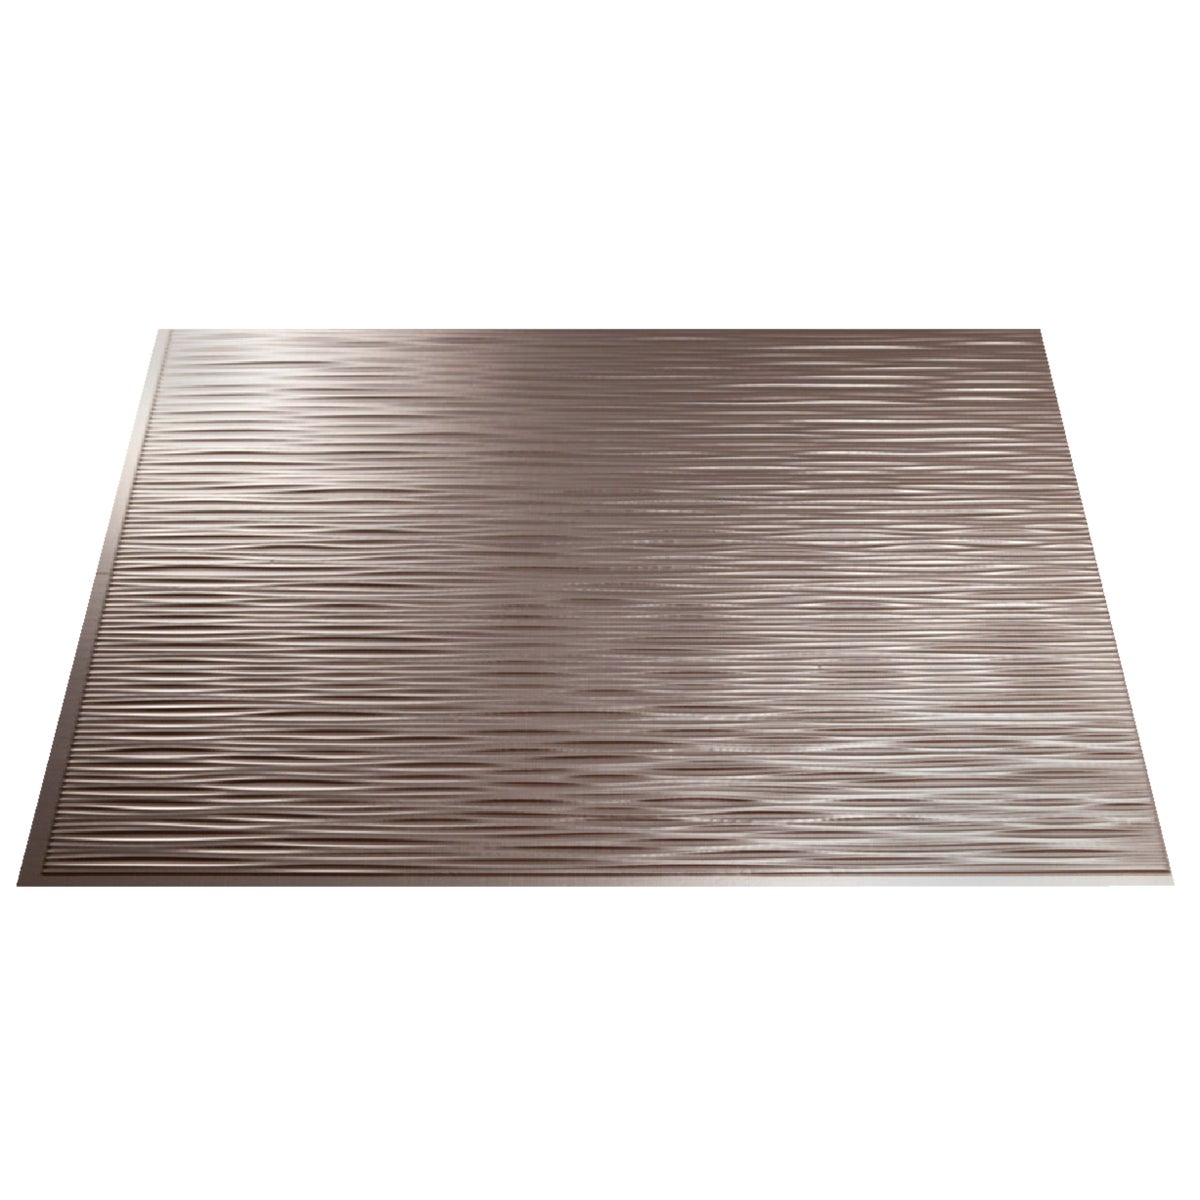 Thermoplastic Decorative Backsplash Panel